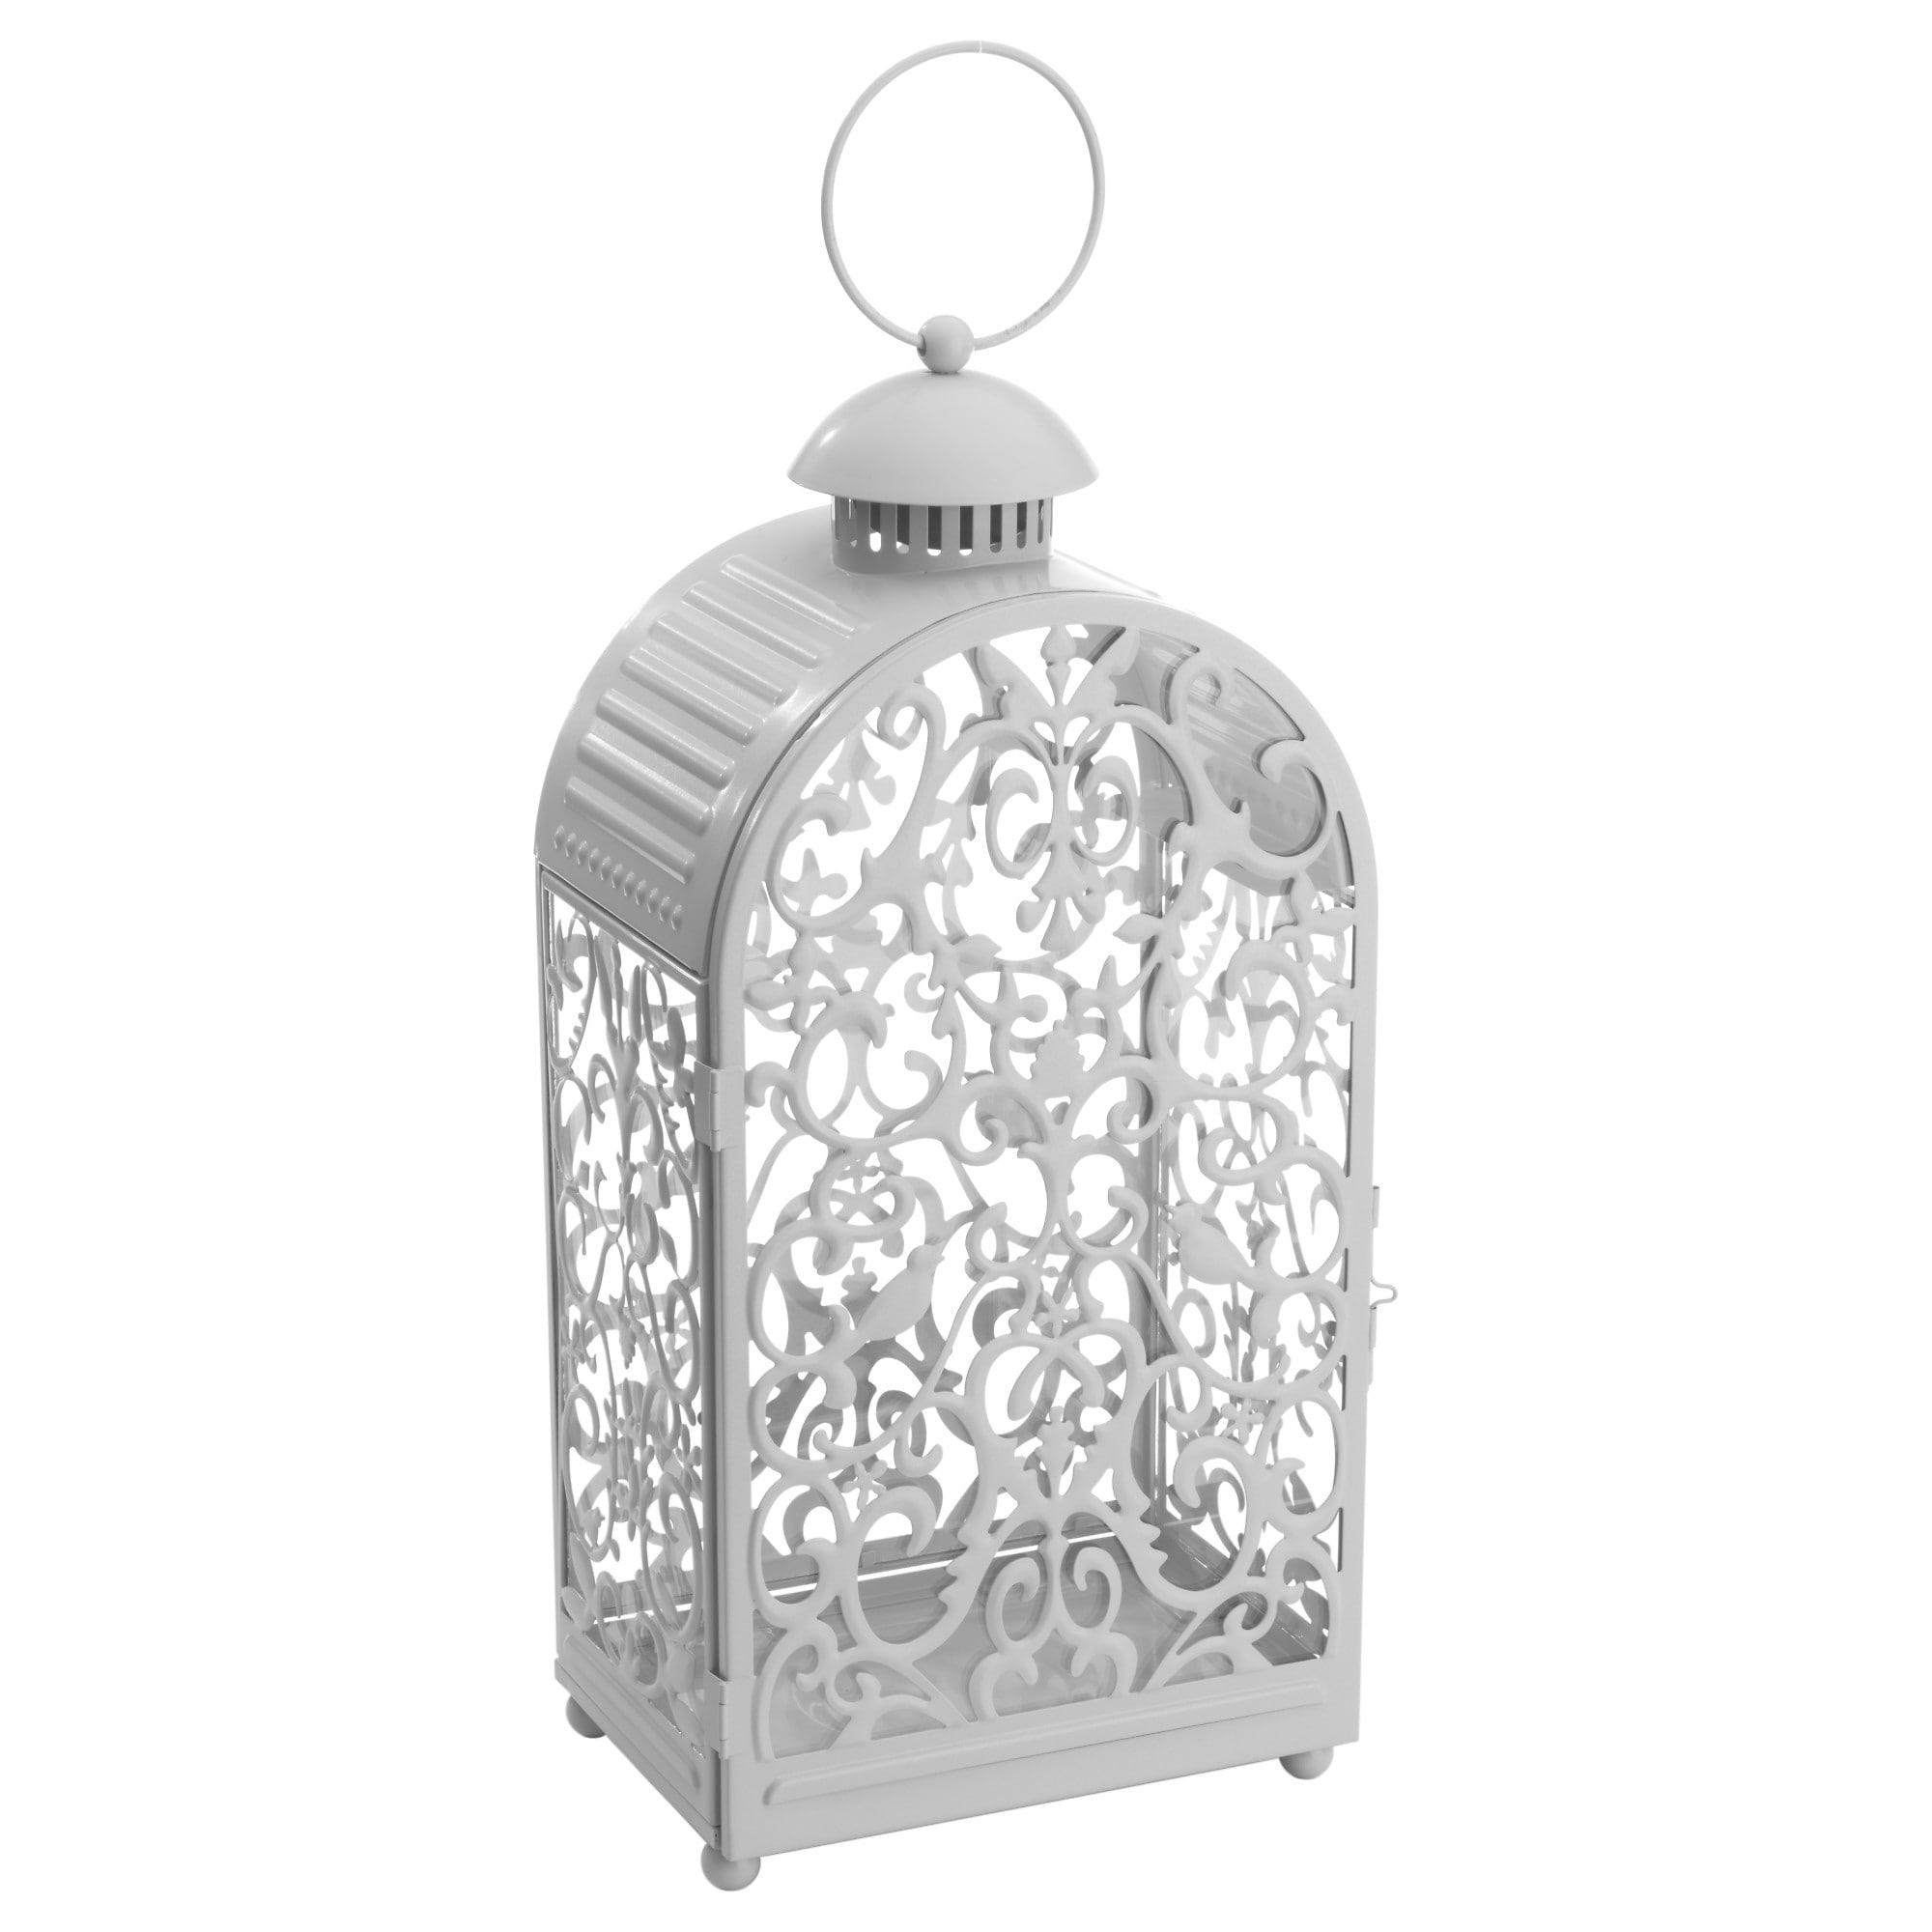 2019 Gottgöra Lantern For Block Candle – Ikea Within Ikea Outdoor Lanterns (View 15 of 20)